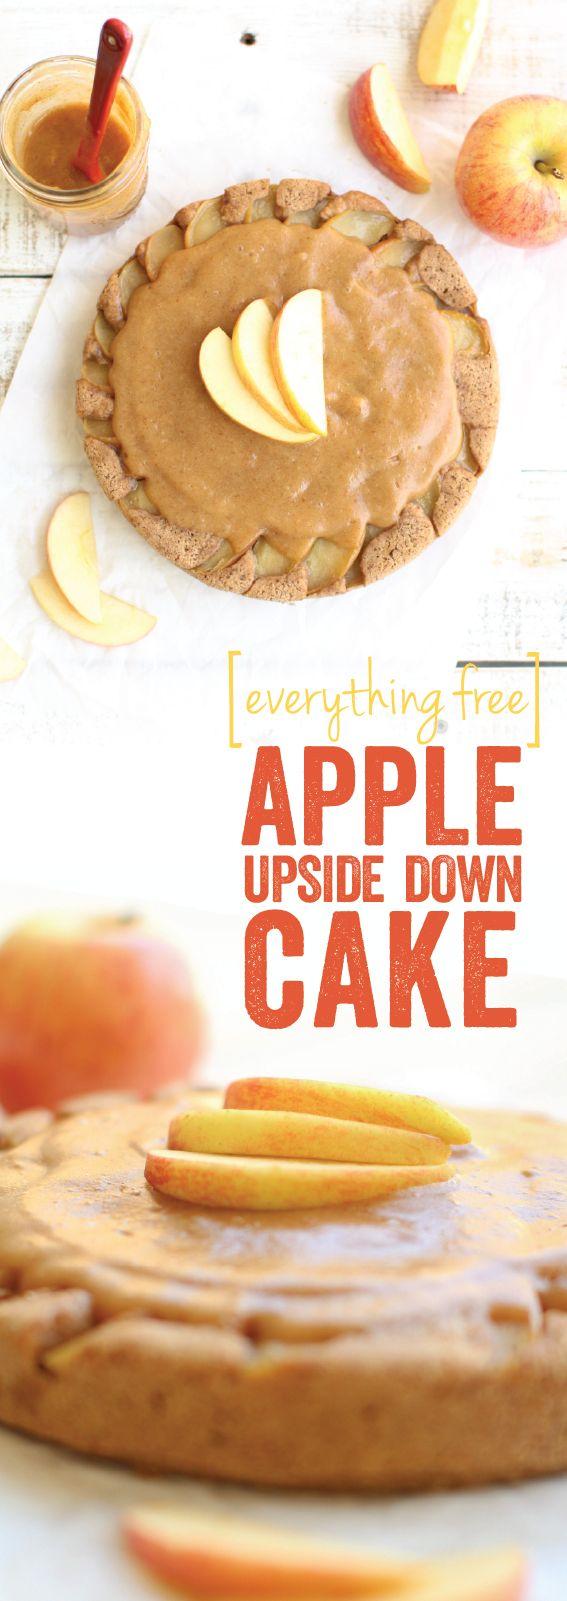 Apple Upside Down Cake #glutenfree #sugarfree #oilfree #nutfree #vegan